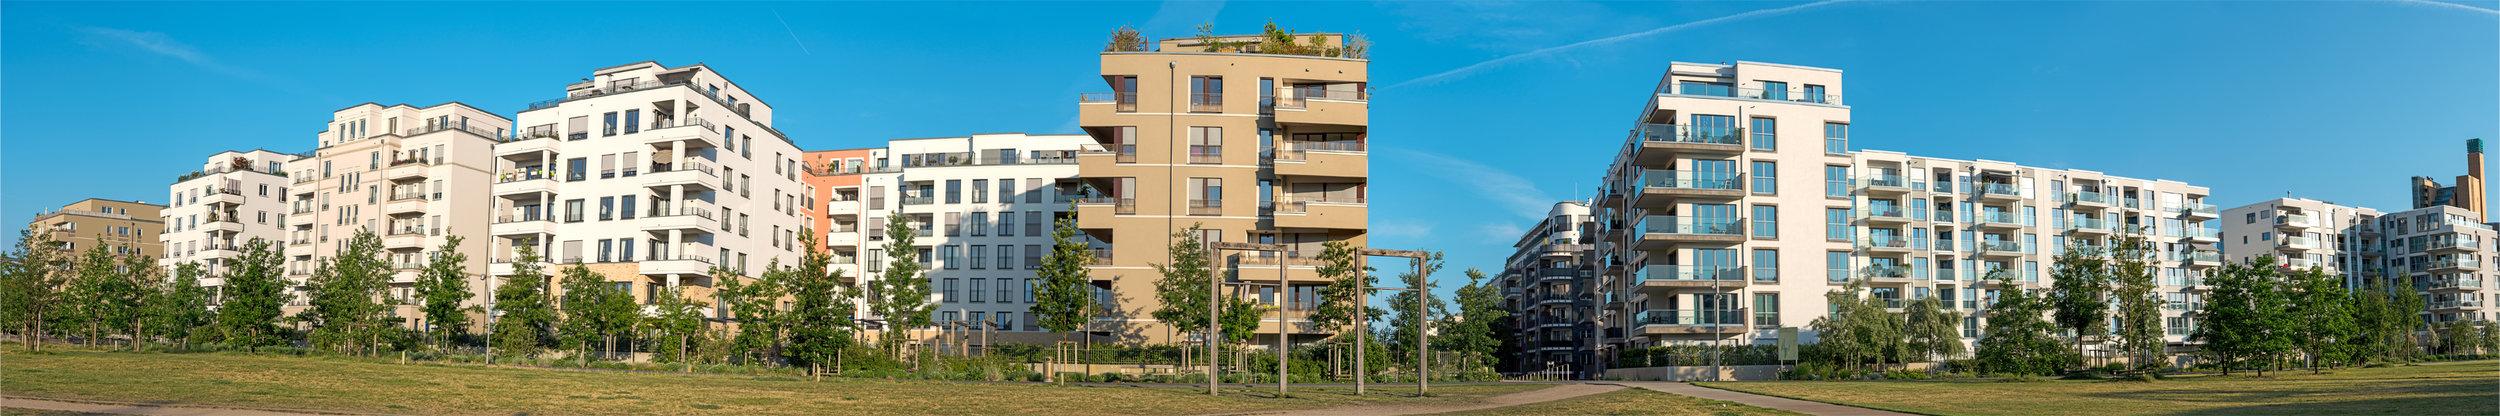 panorama-of-a-housing-development.jpg